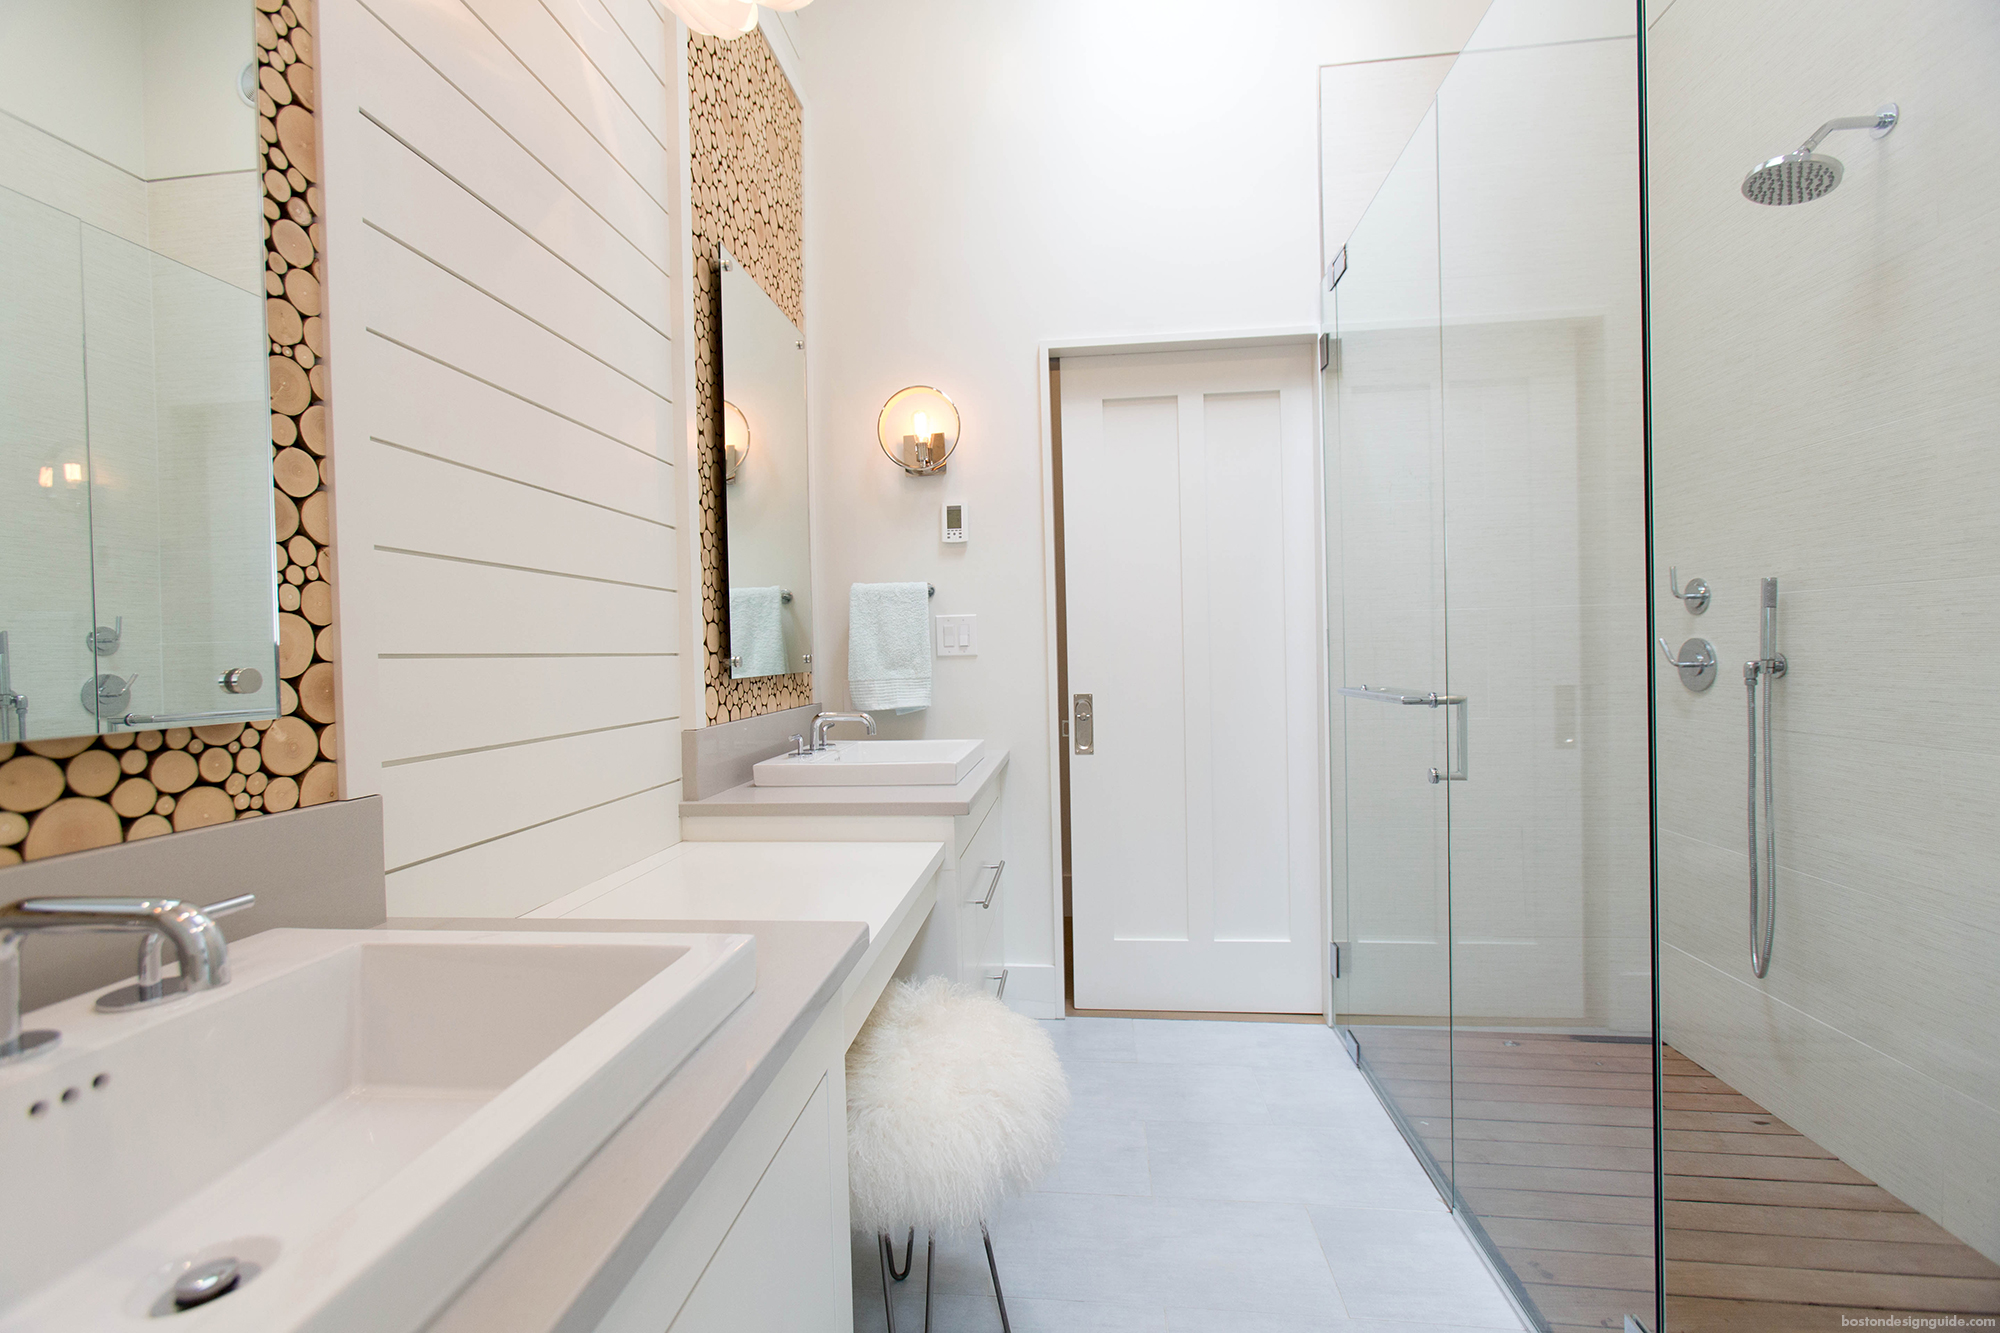 Bathroom tile showroom bathroom tiles showroom in mumbai for Bathroom designs mumbai